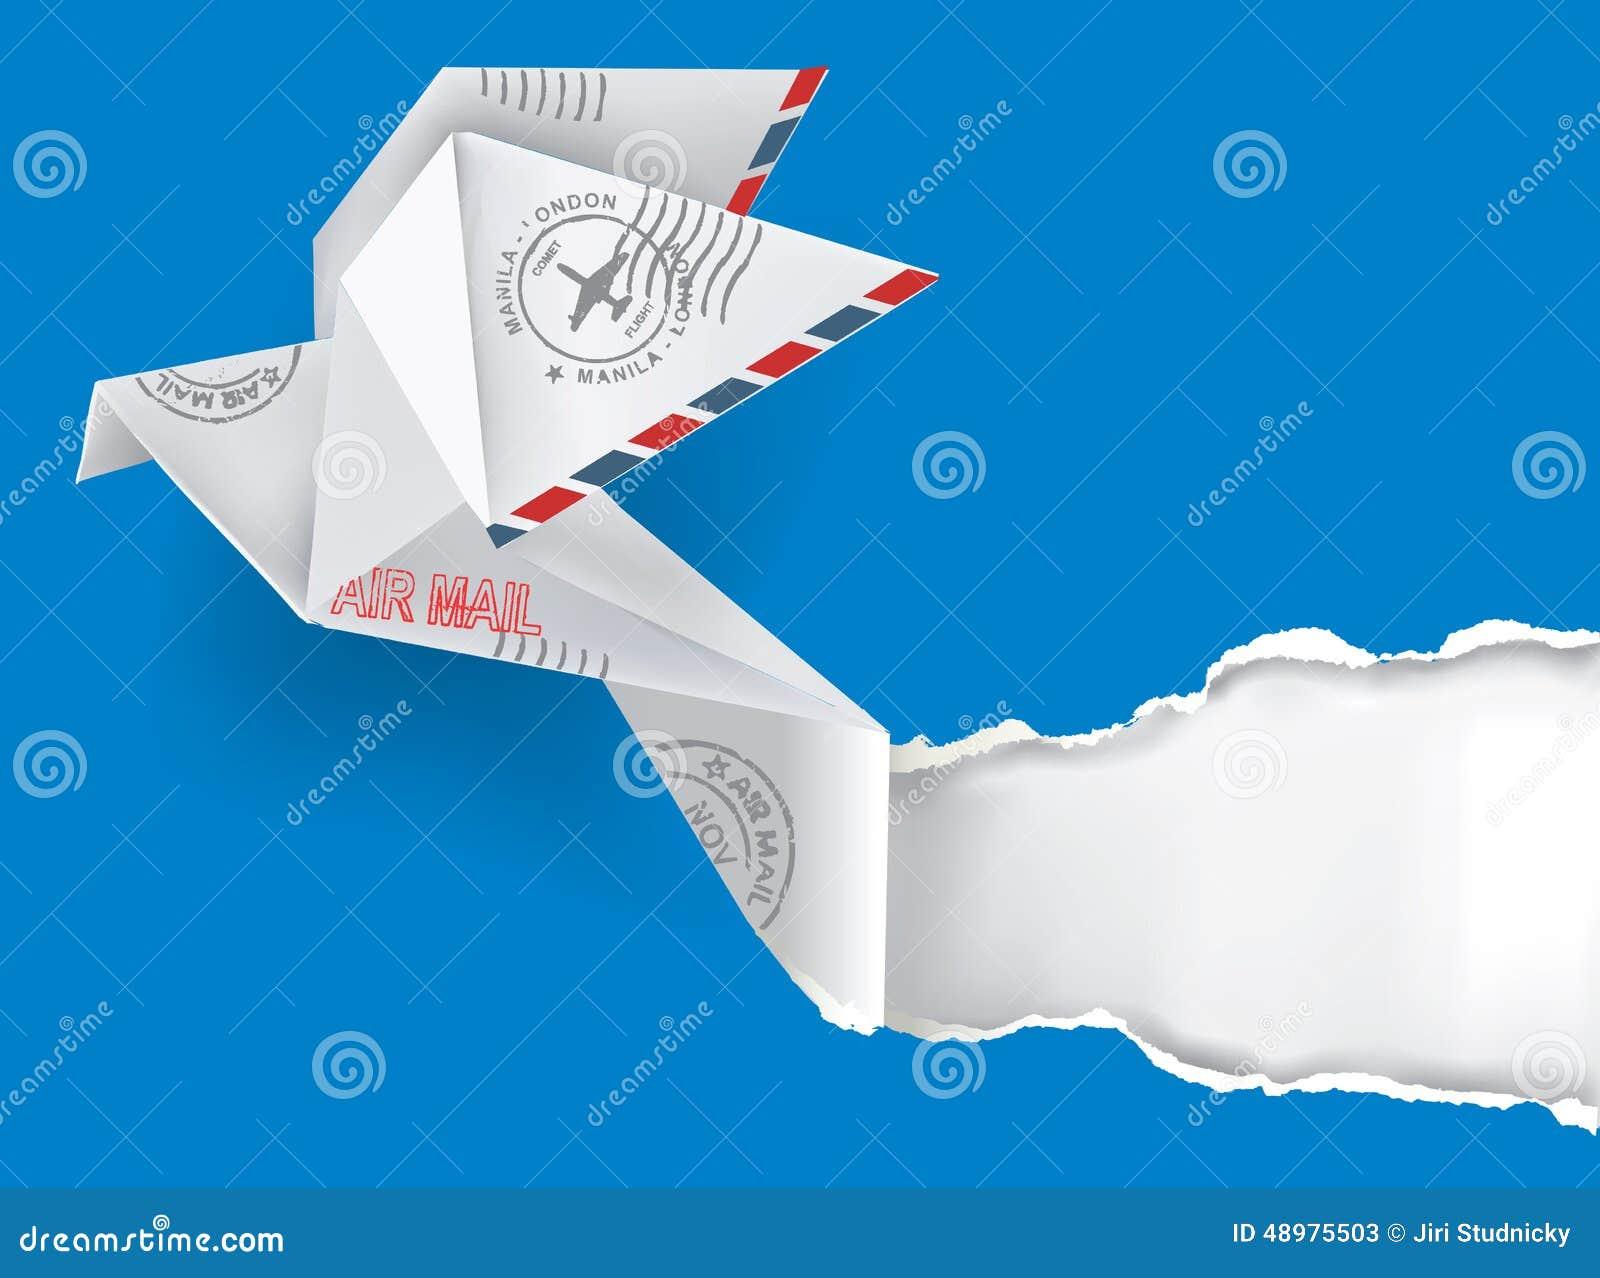 Origami - Wikipedia | 1055x1300